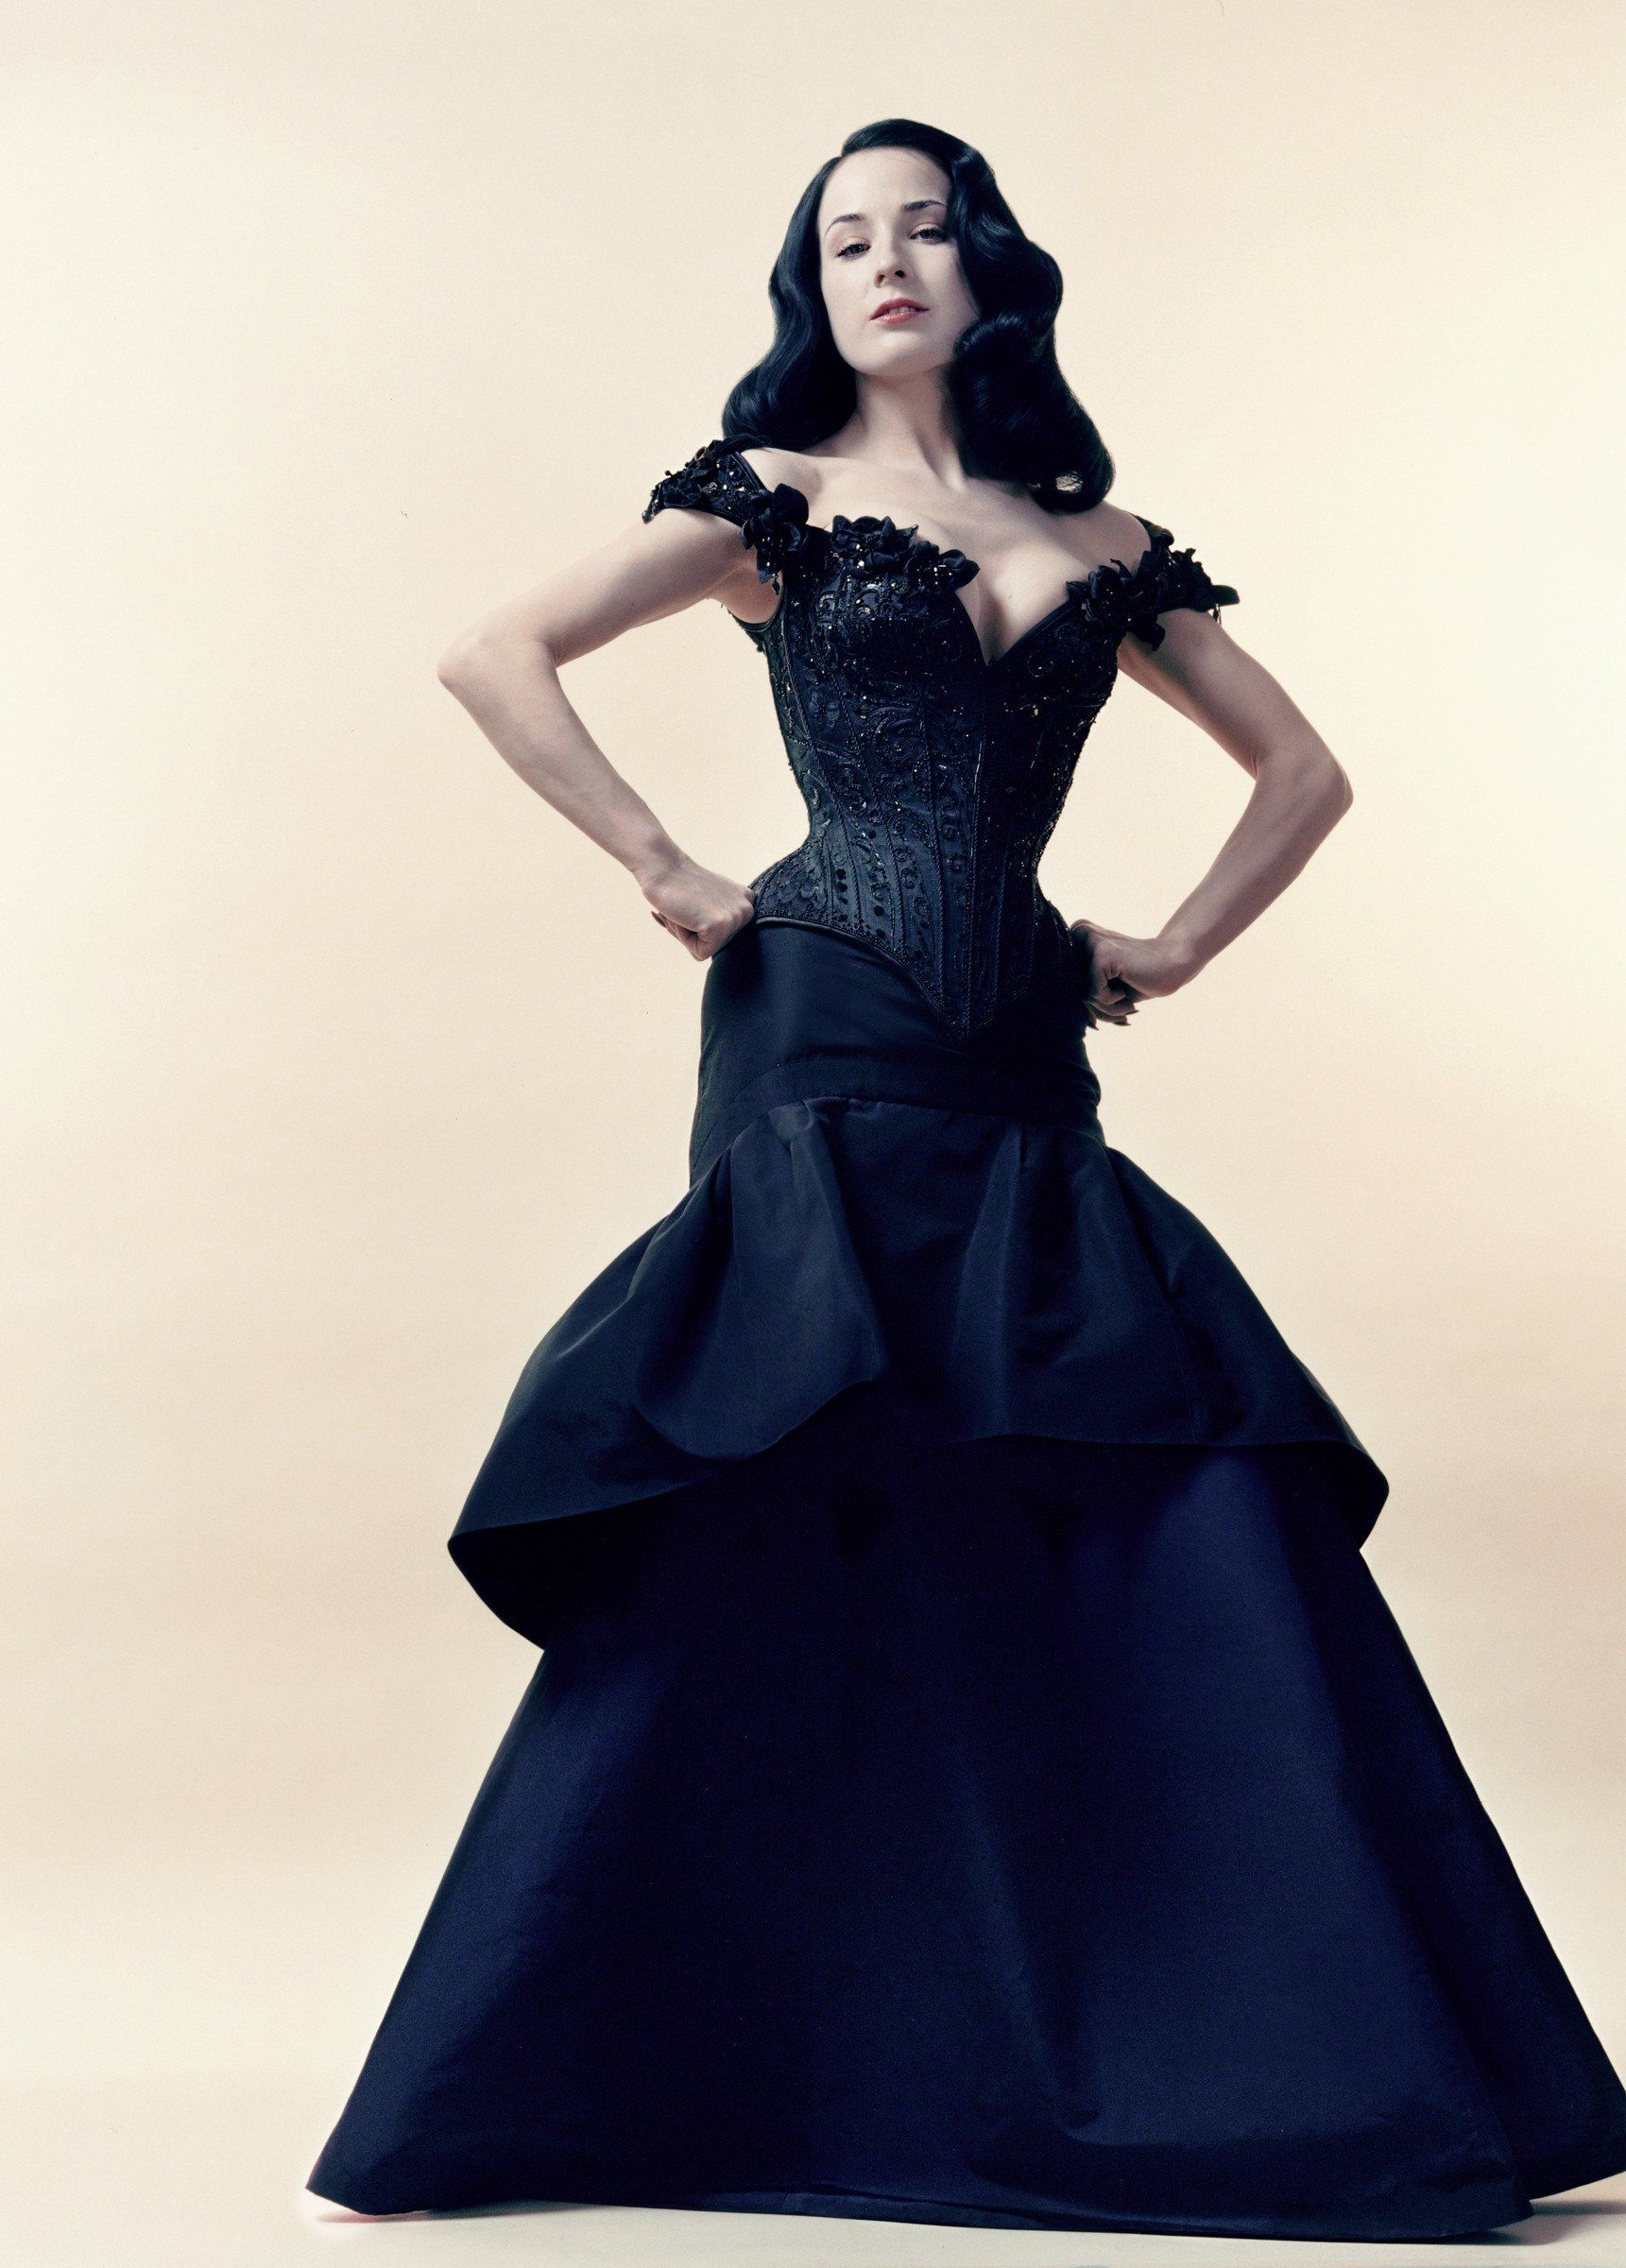 Dita Von Teese For Vogue India January 2013 Fab Fashion Fix